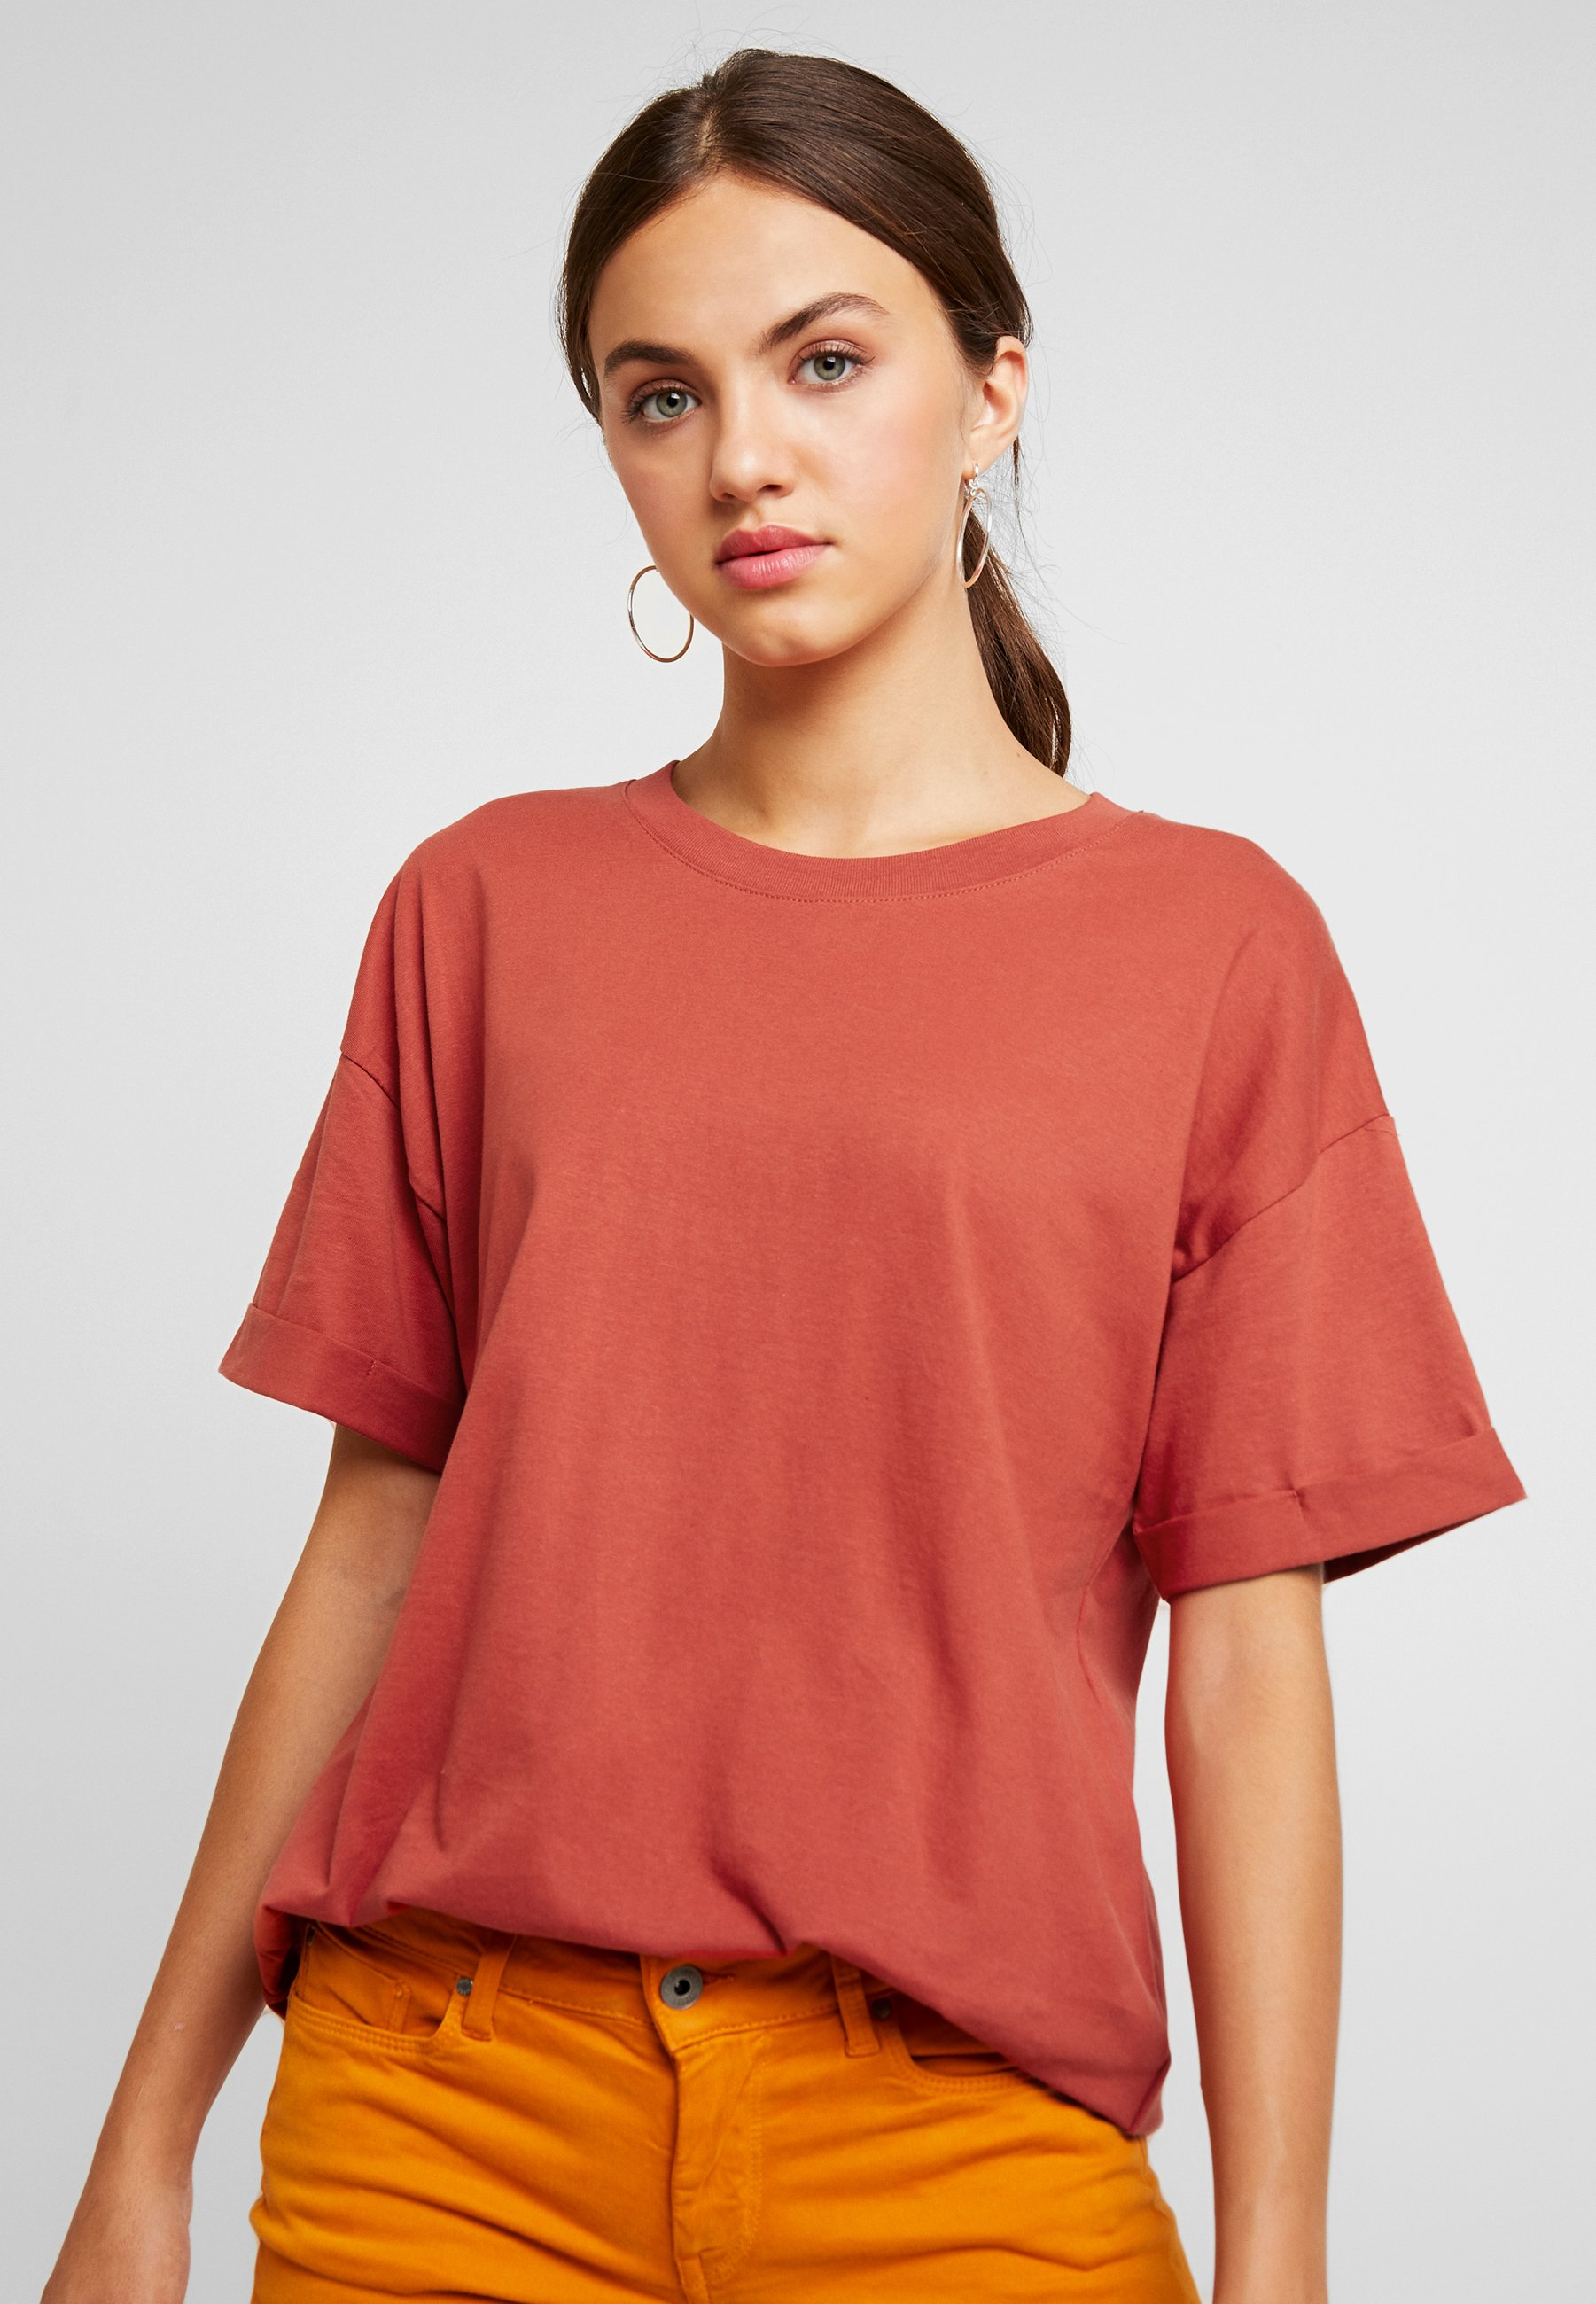 Relaxed TeeT The On Basique Red Cotton Rustic shirt Boyfriend u13lKcTFJ